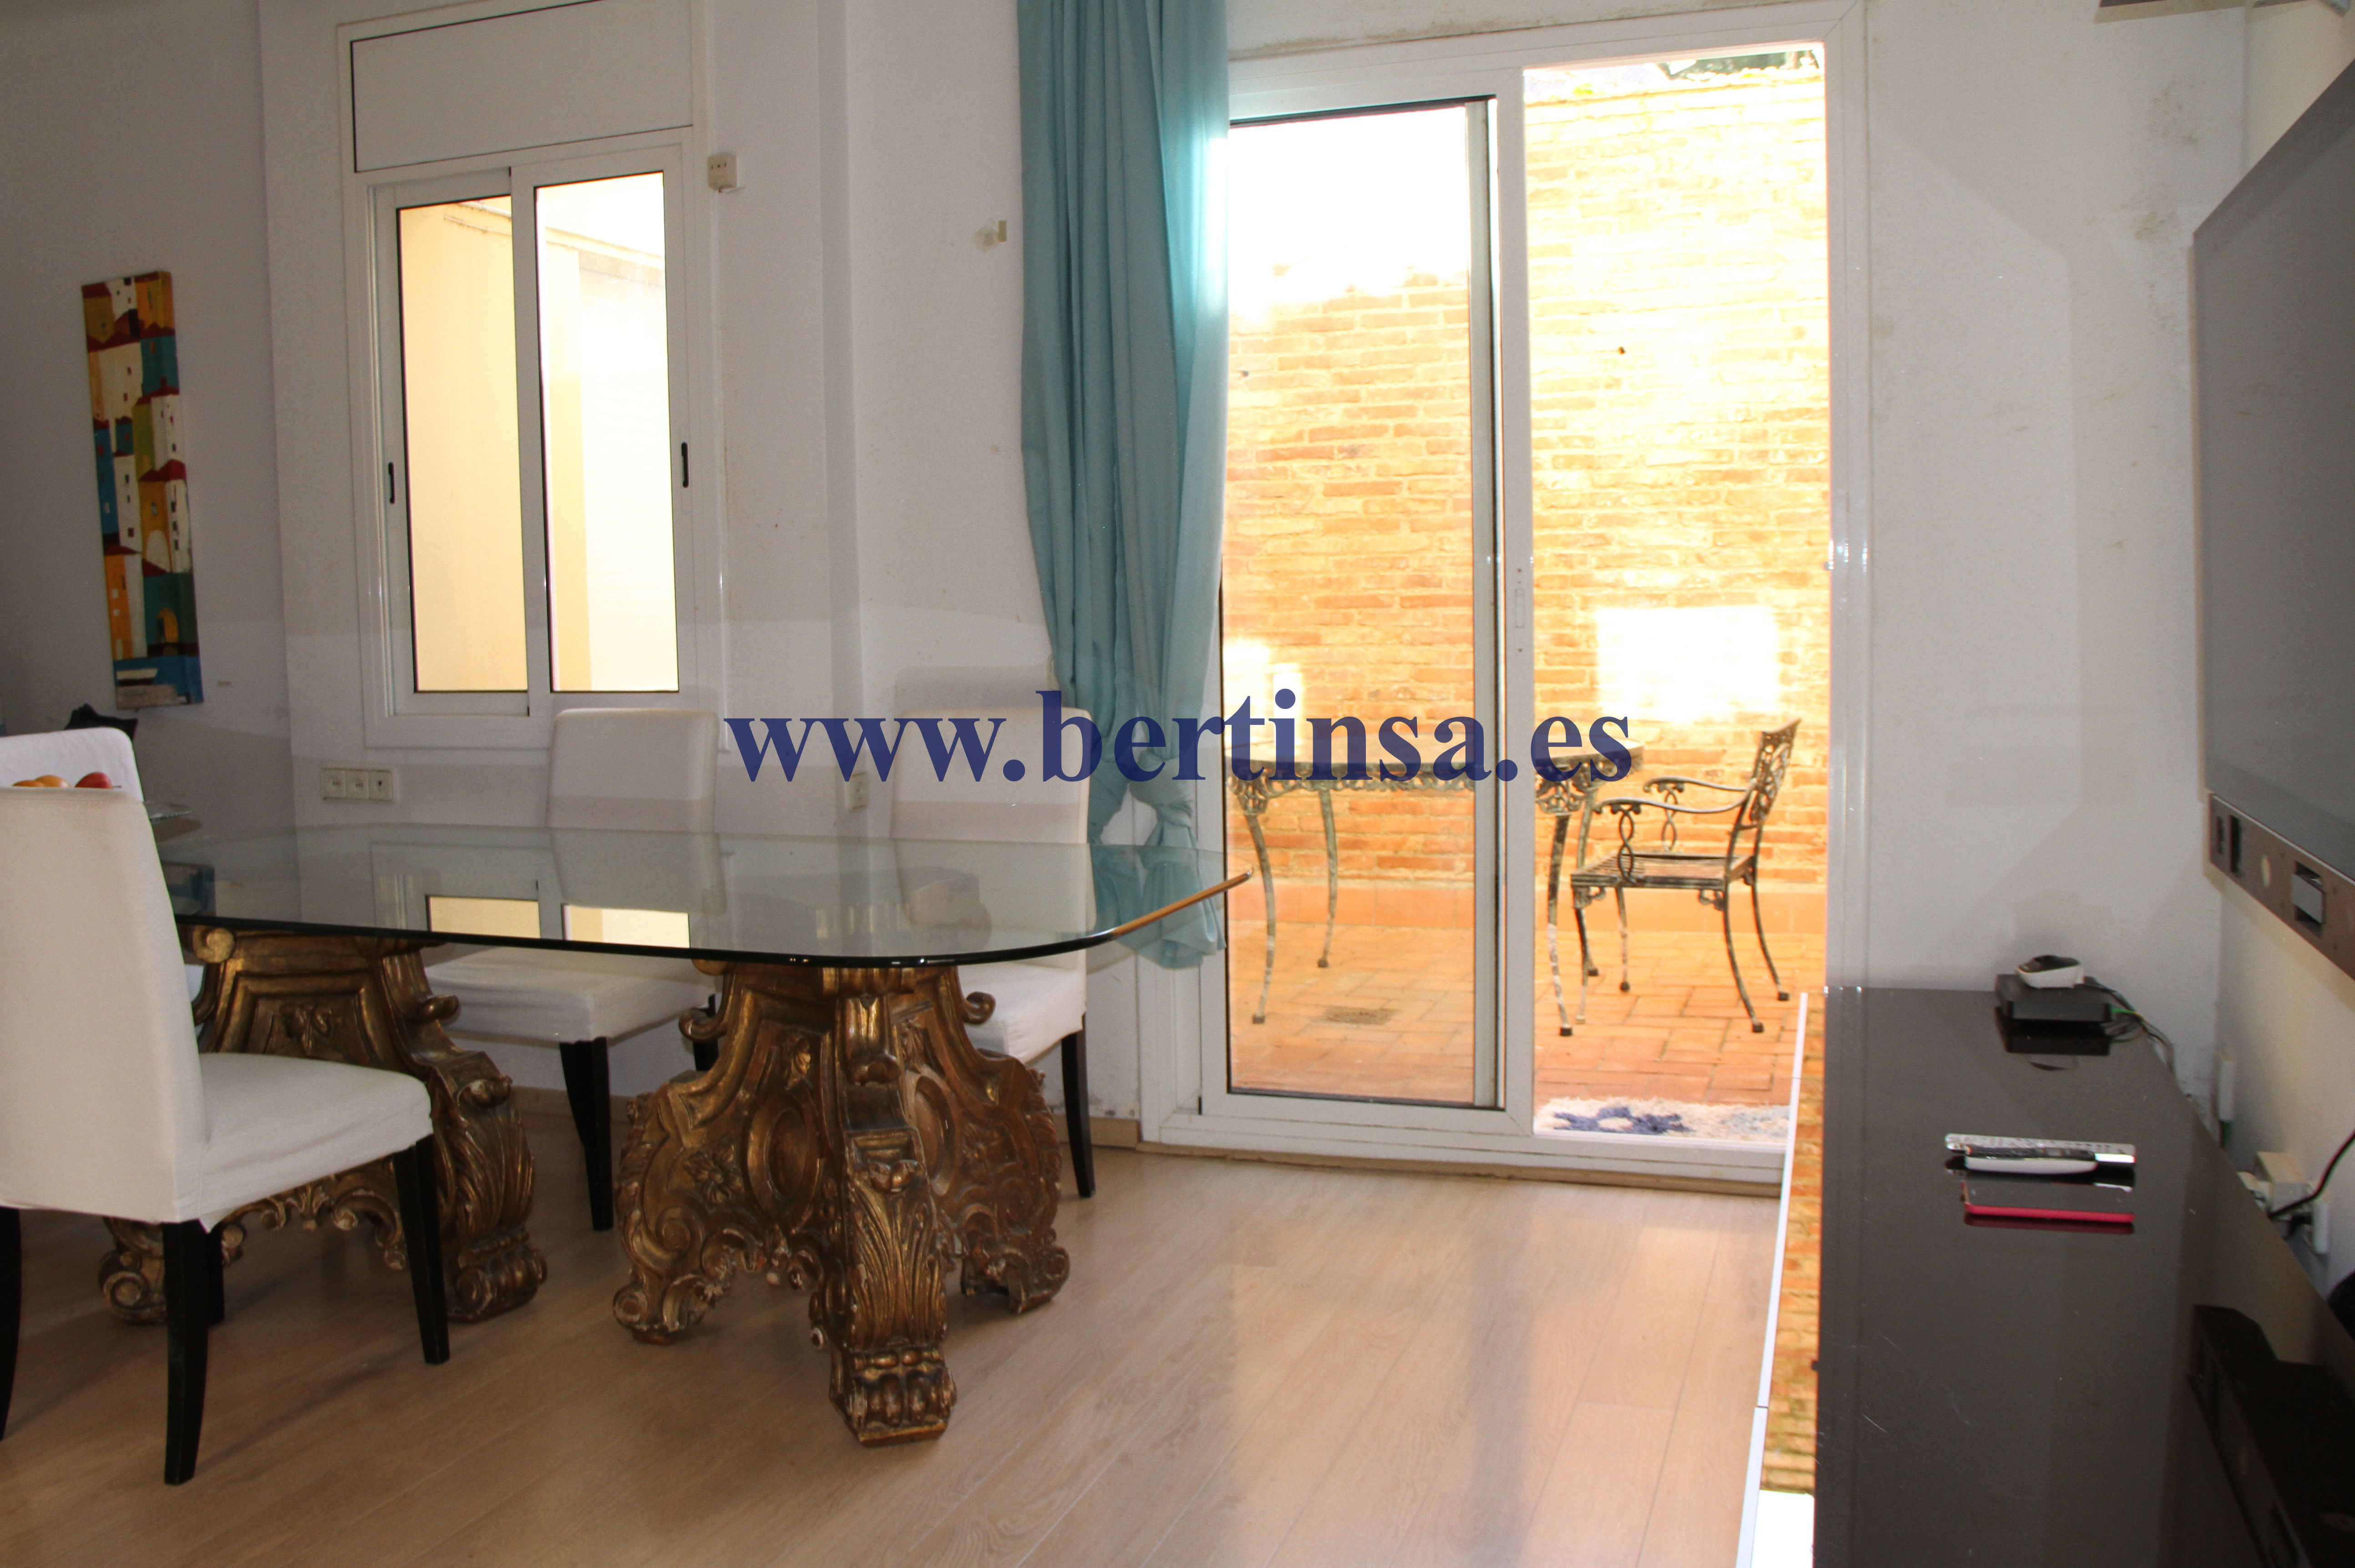 Apartamento C/ Osi  380.000€: Visita nuestras inmuebles de Bertinsa Real Estate, Investments & Sale Services